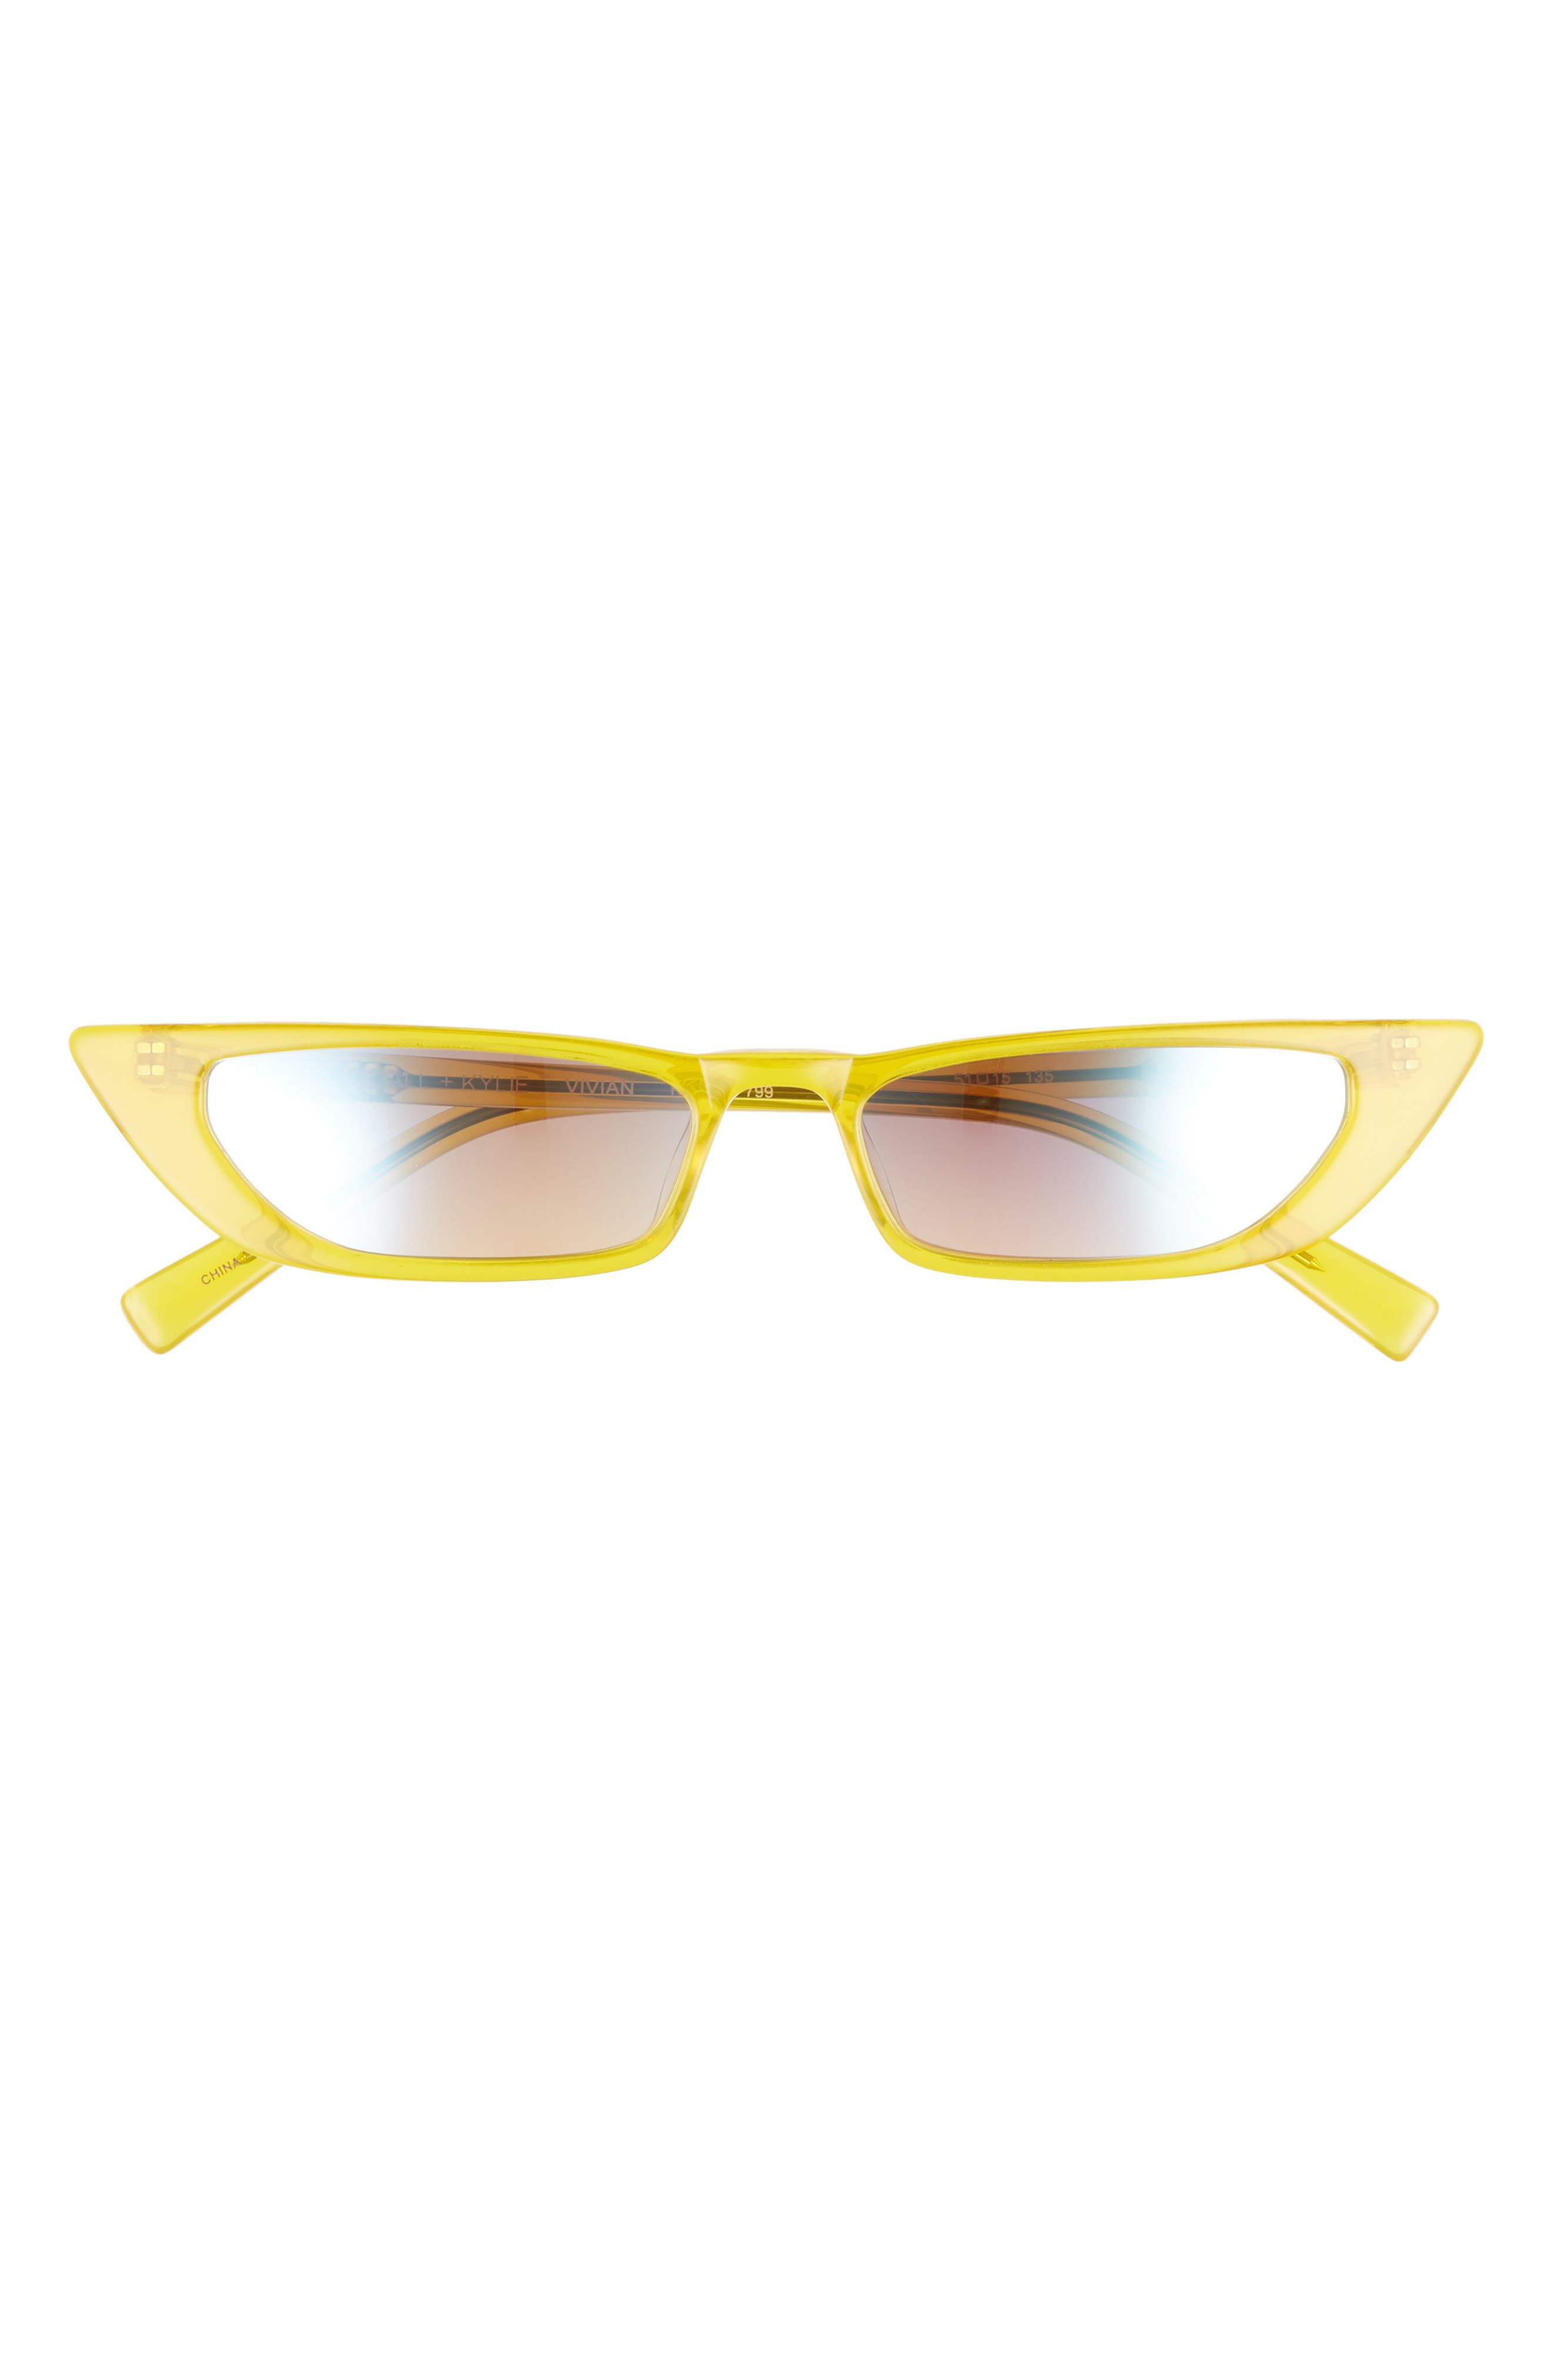 Vivian Extreme 51mm Cat Eye Sunglasses,                             Alternate thumbnail 3, color,                             SUN CITY YELLOW/ SOLID SMOKE